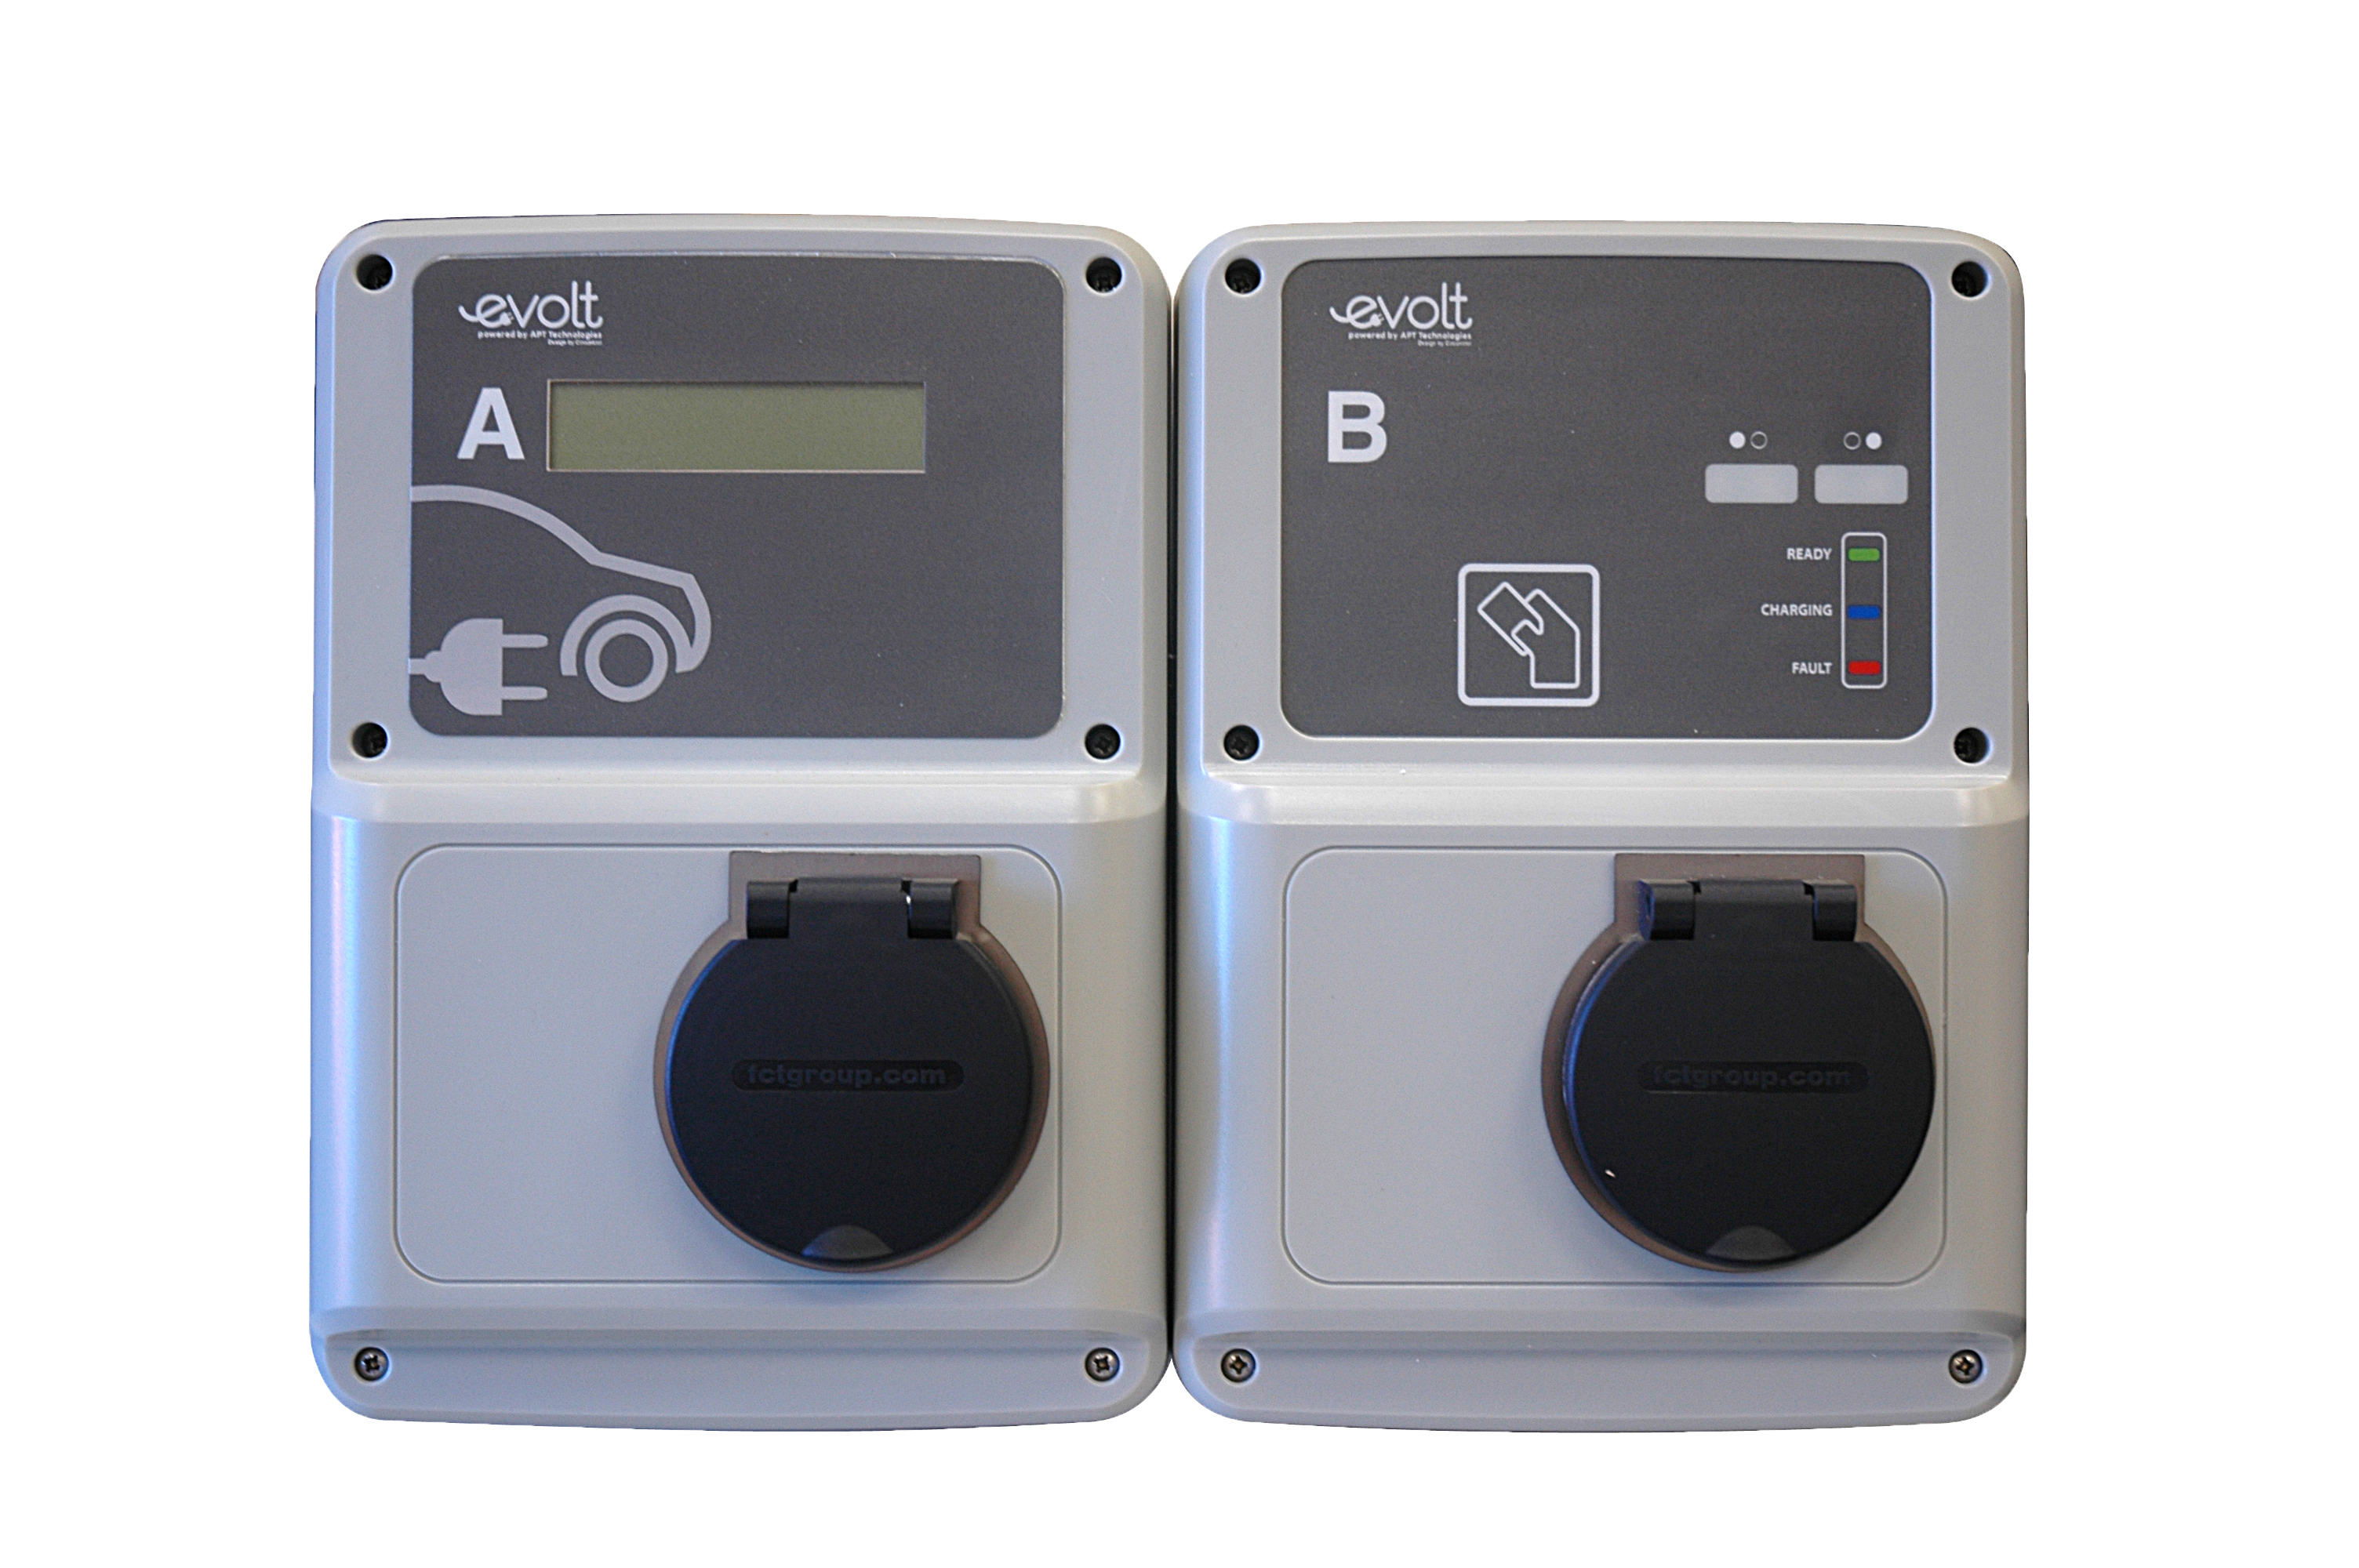 Dual Wall Box Smart